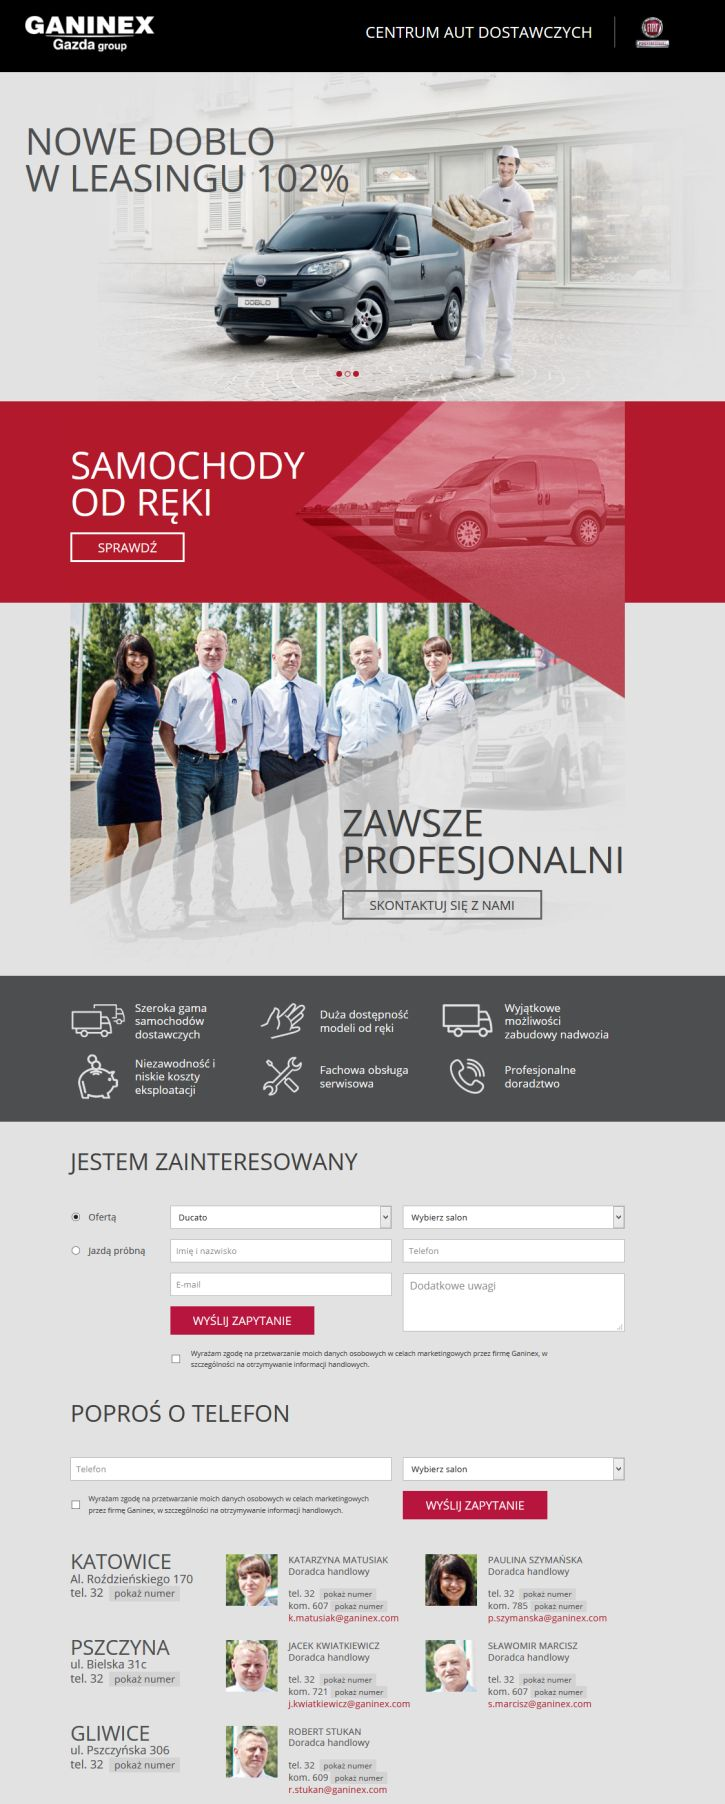 ganinex-professional-725.jpg